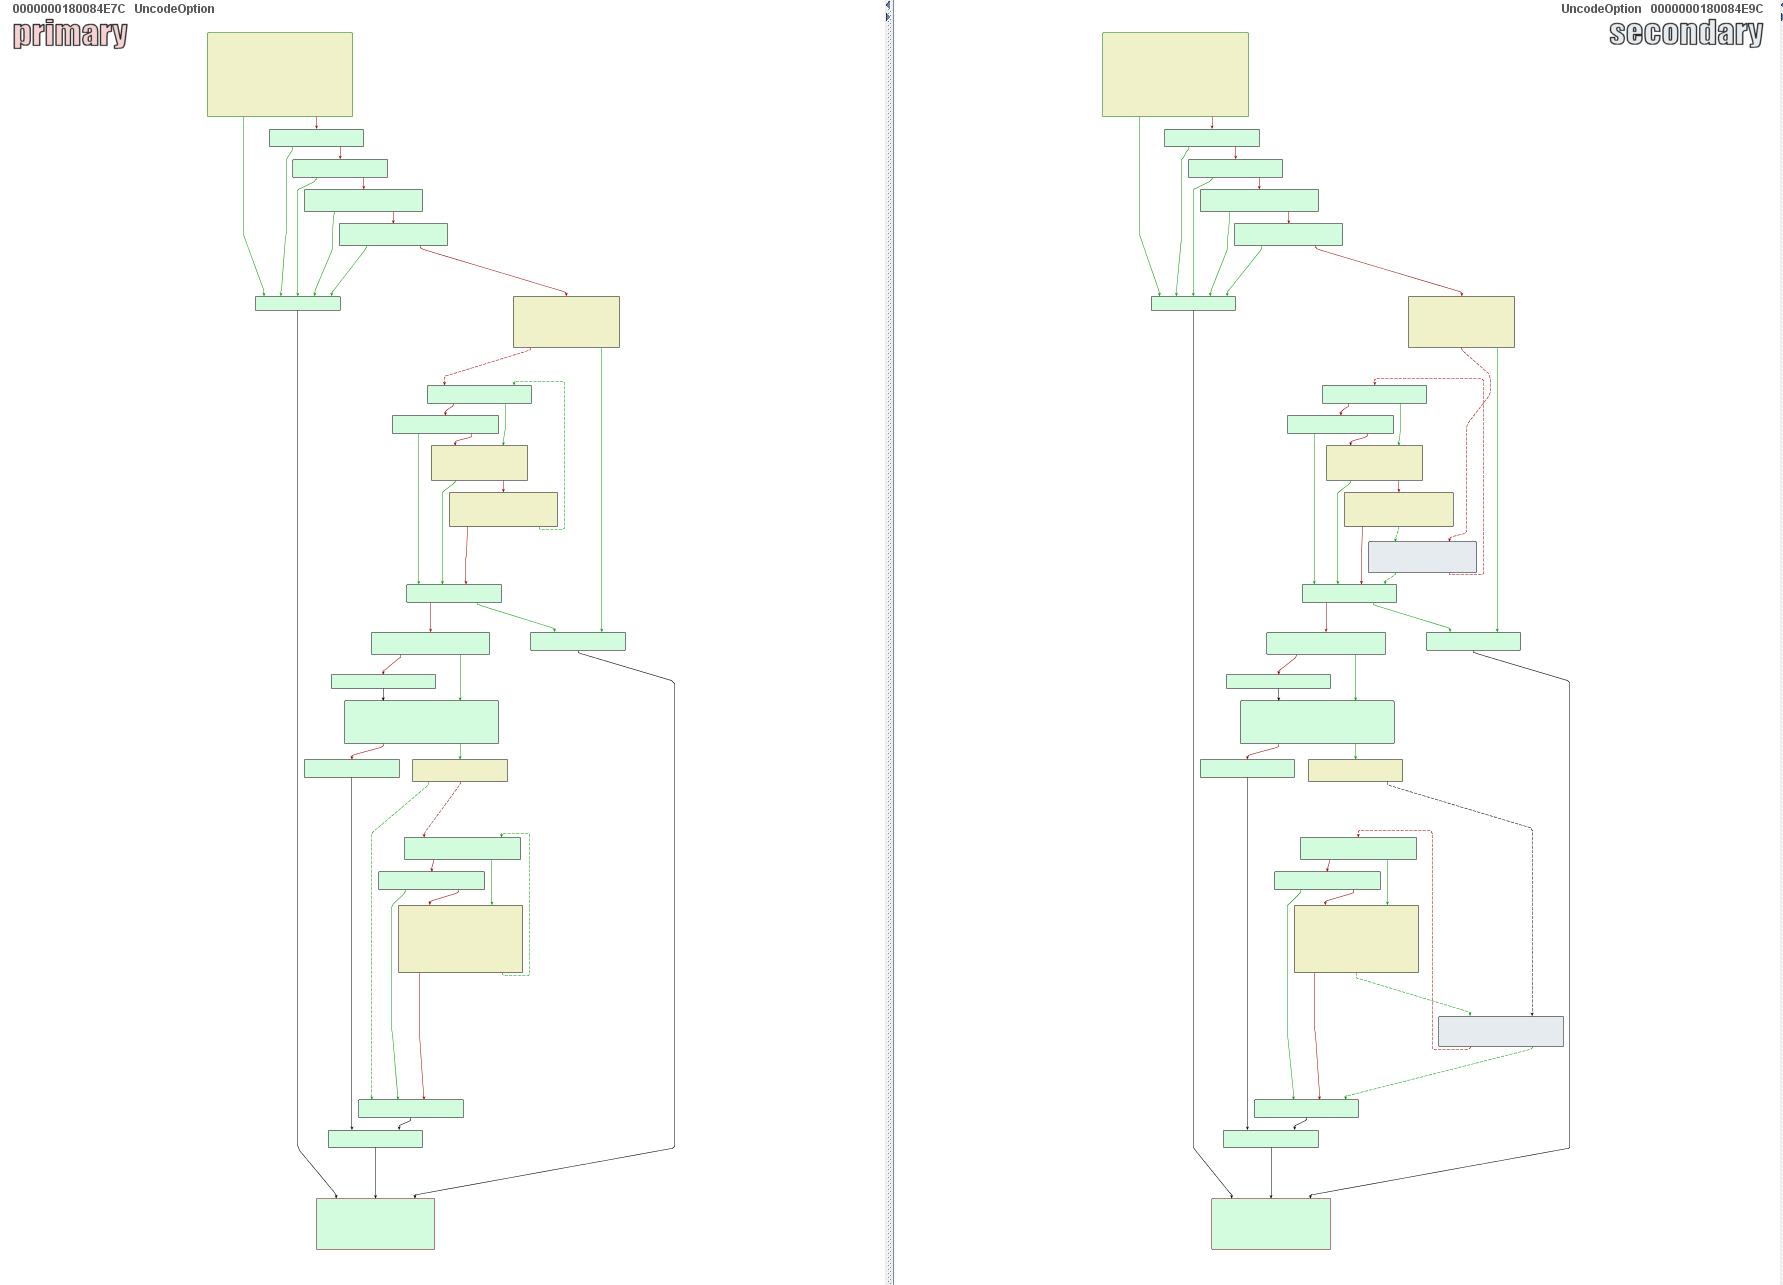 Analyzing a Windows DHCP Server Bug (CVE-2019-0626